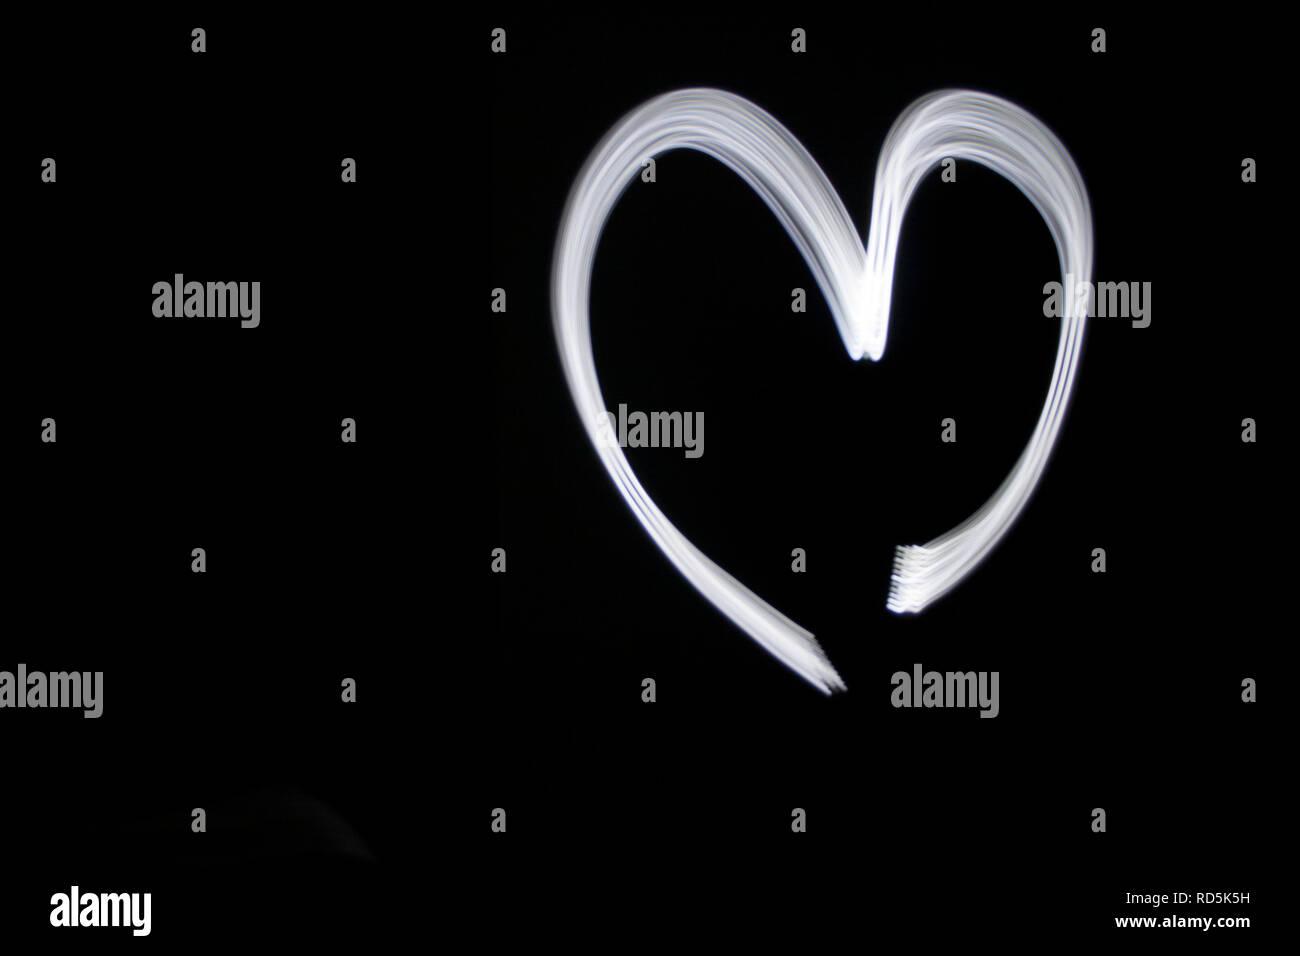 Heart Light Painting Stock Photo